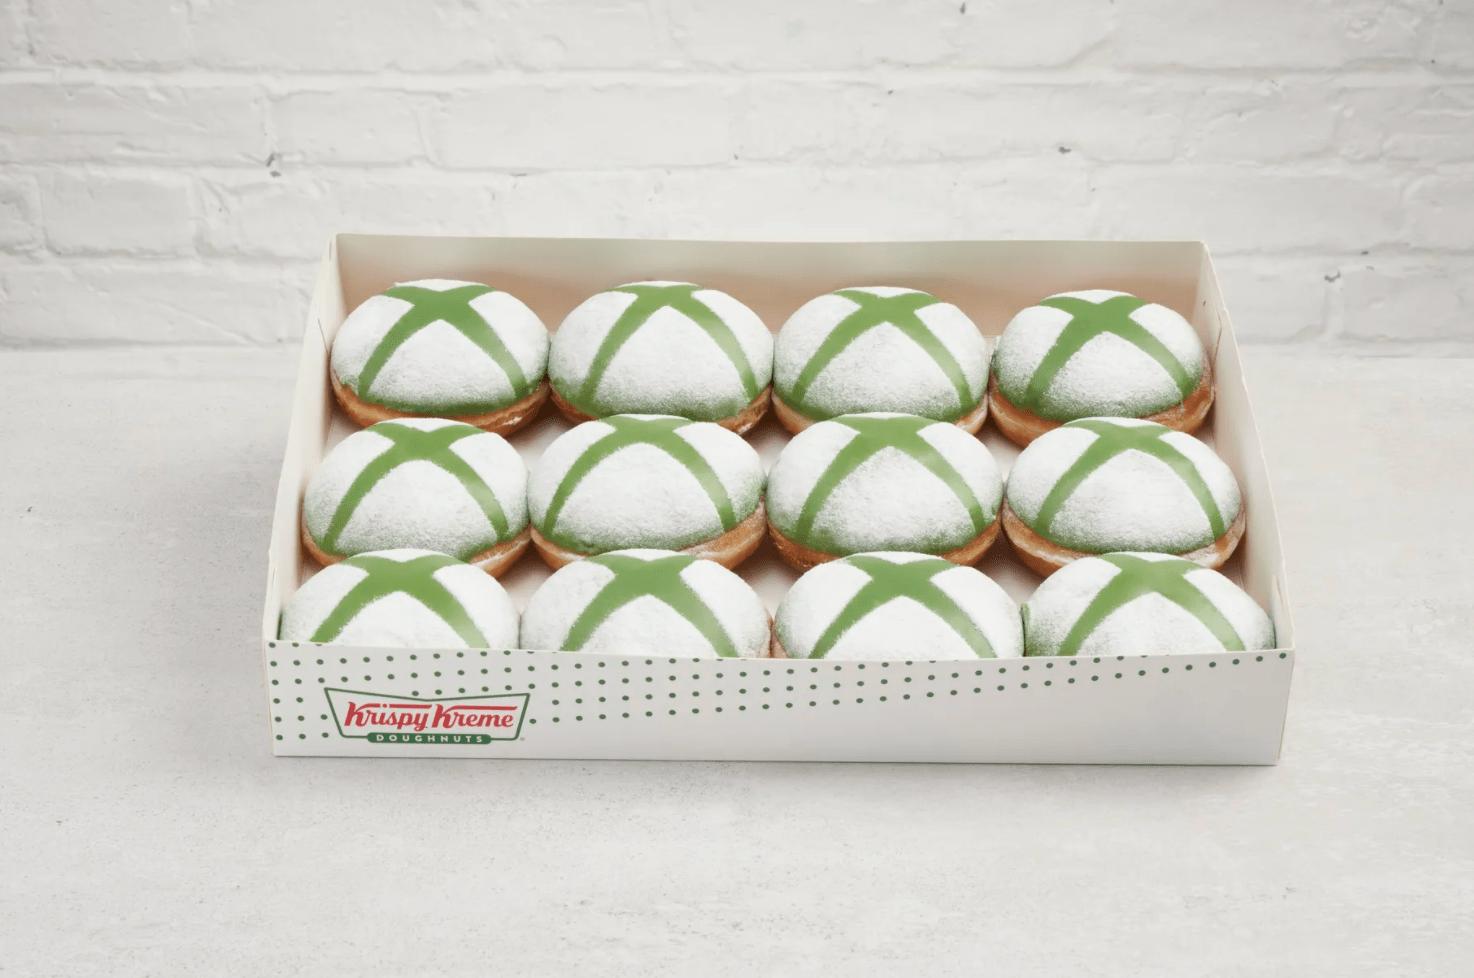 Krispy Kreme Teams Up With Microsoft For Xbox-Themed Doughnut